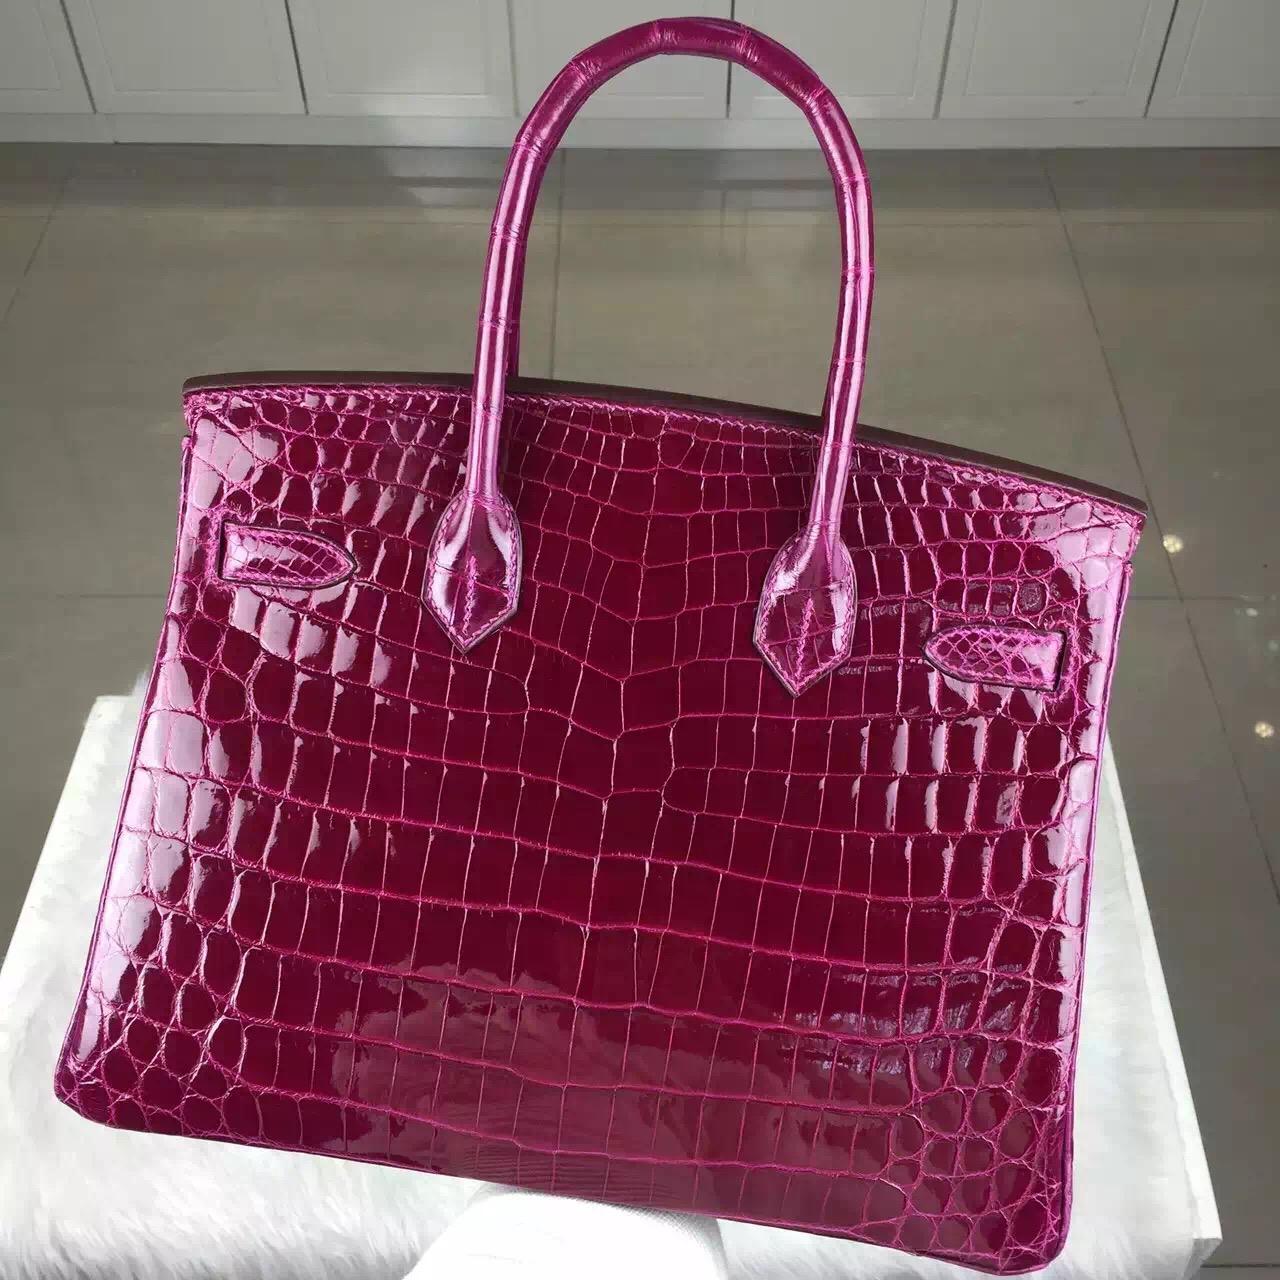 New Fuchsia Color Crocodile Shiny Leather Hermes Birkin Bag30cm Silver Hardware